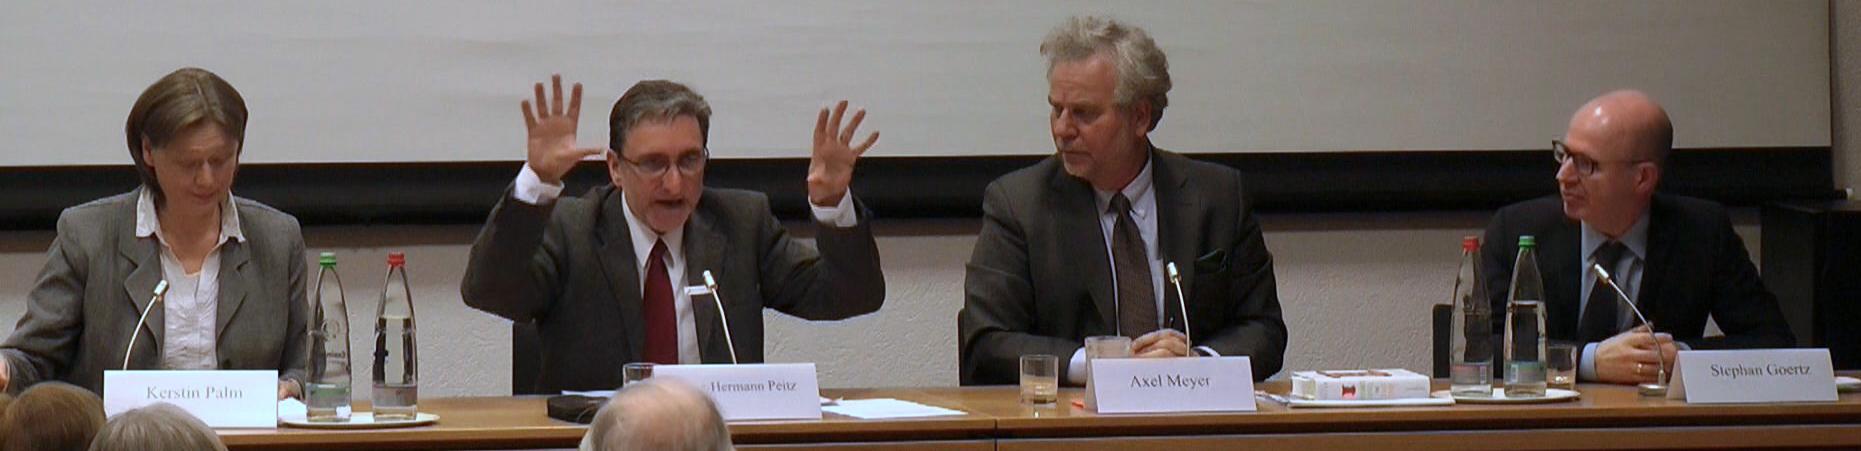 Prof. Dr. Kerstin Palm, Dr. Heinz-Hermann Peitz (Moderation), Prof. Dr. Axel Meyer, Prof. Dr. Stephan Goertz (v.l.n.r.)